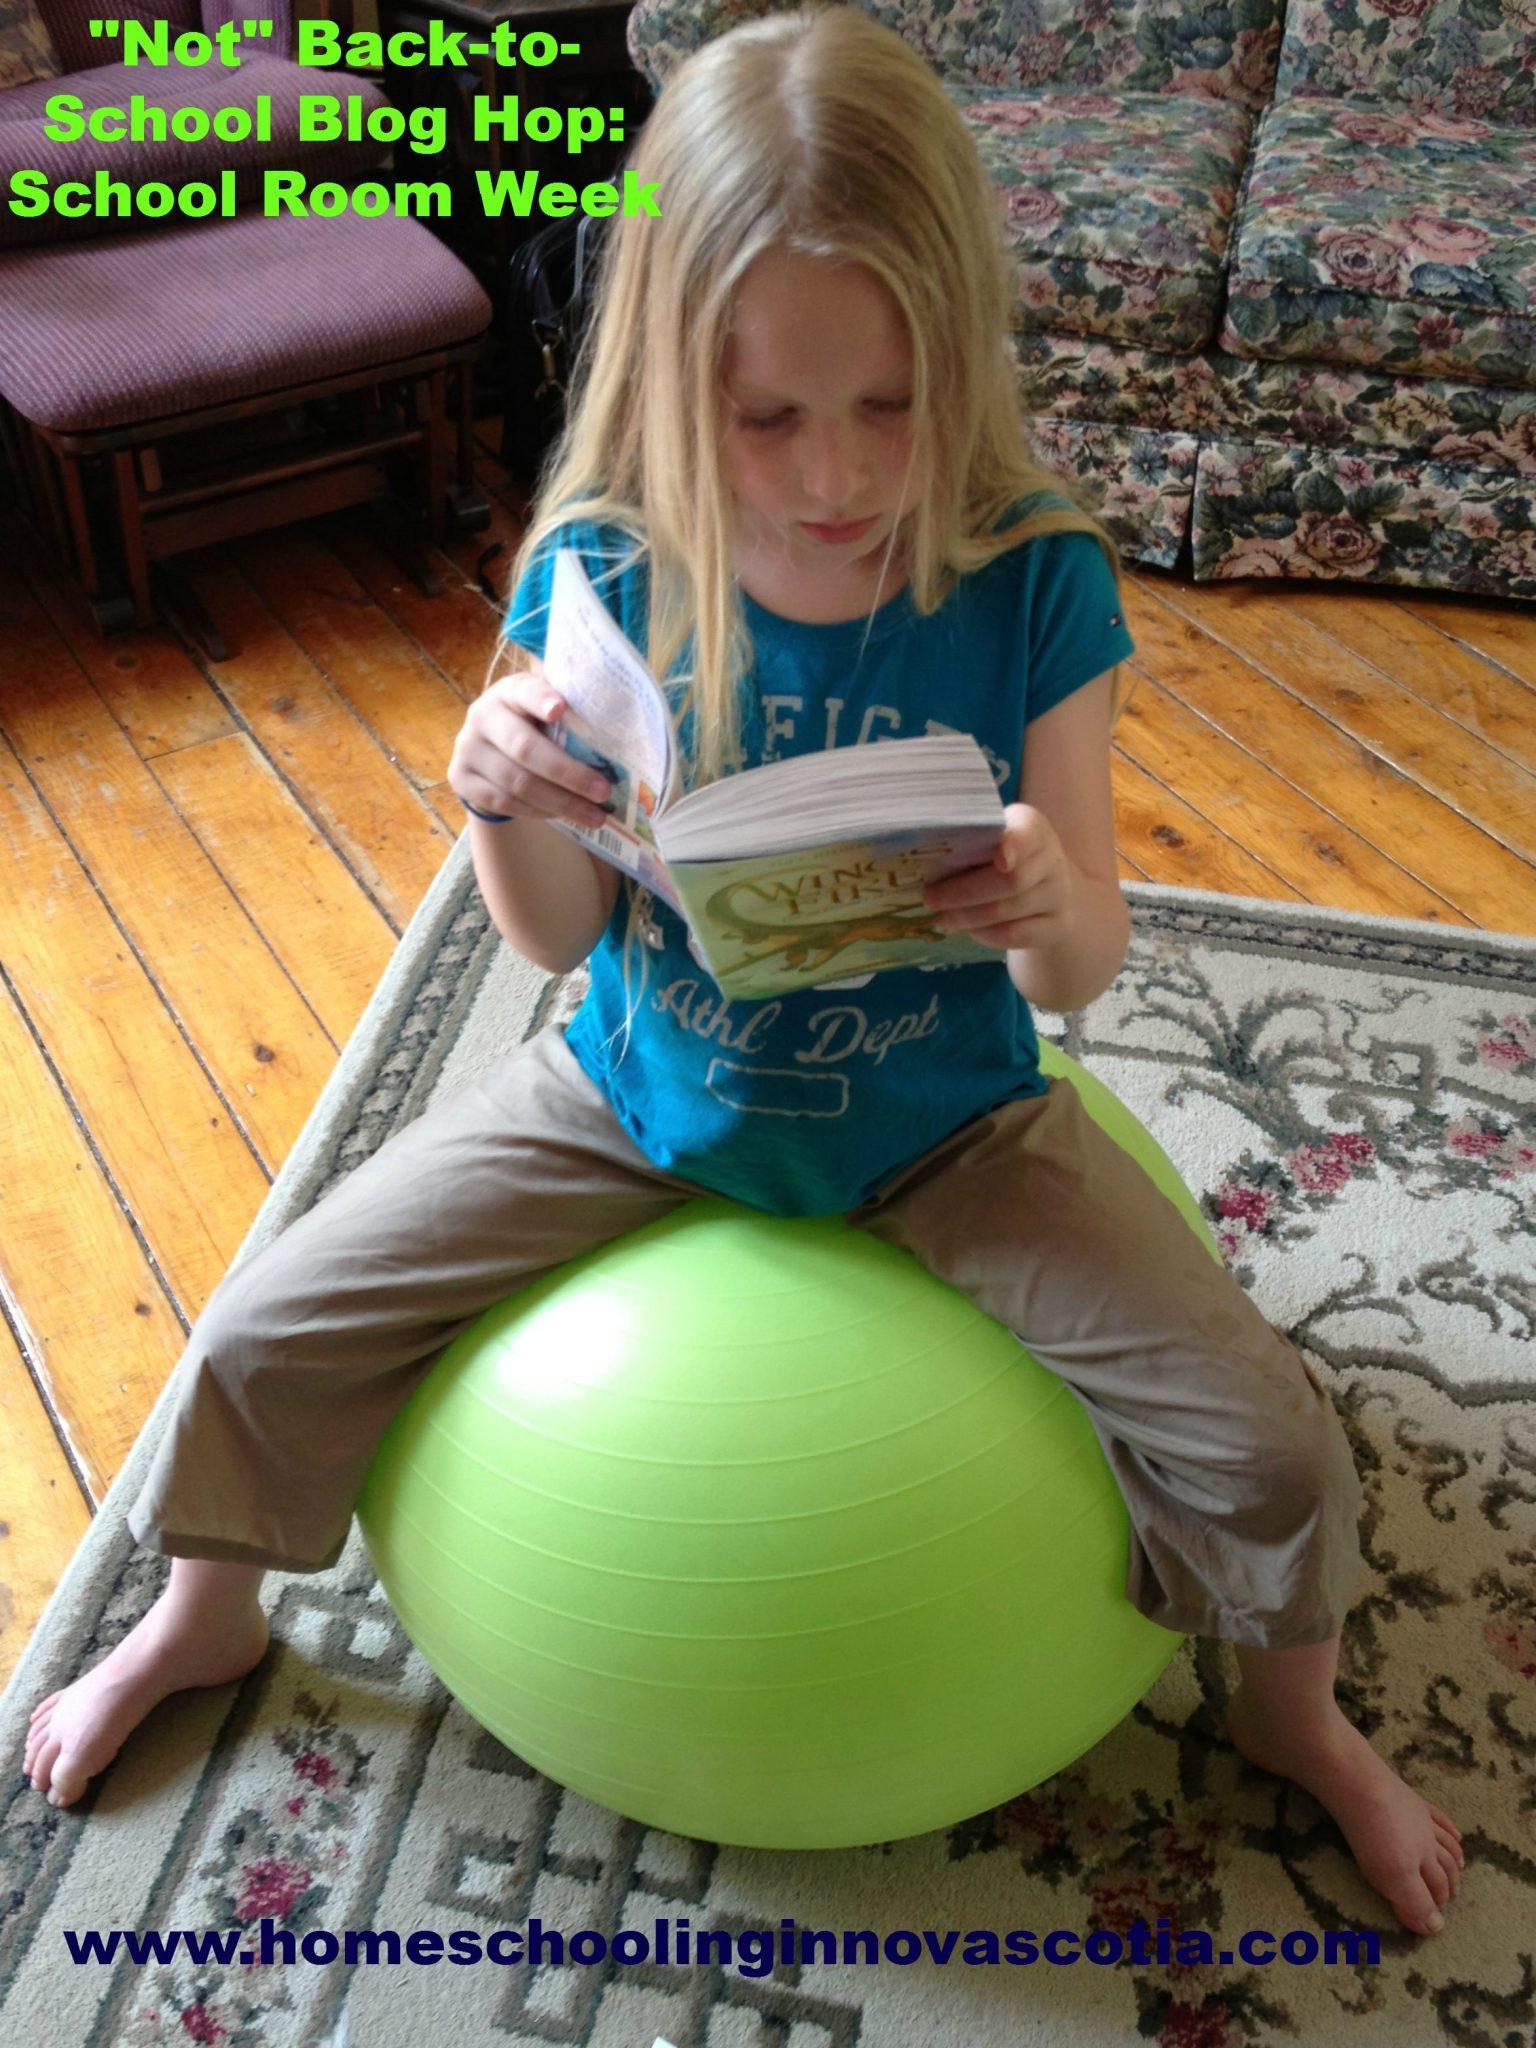 Not Back to School Blog Hop - School Room Week